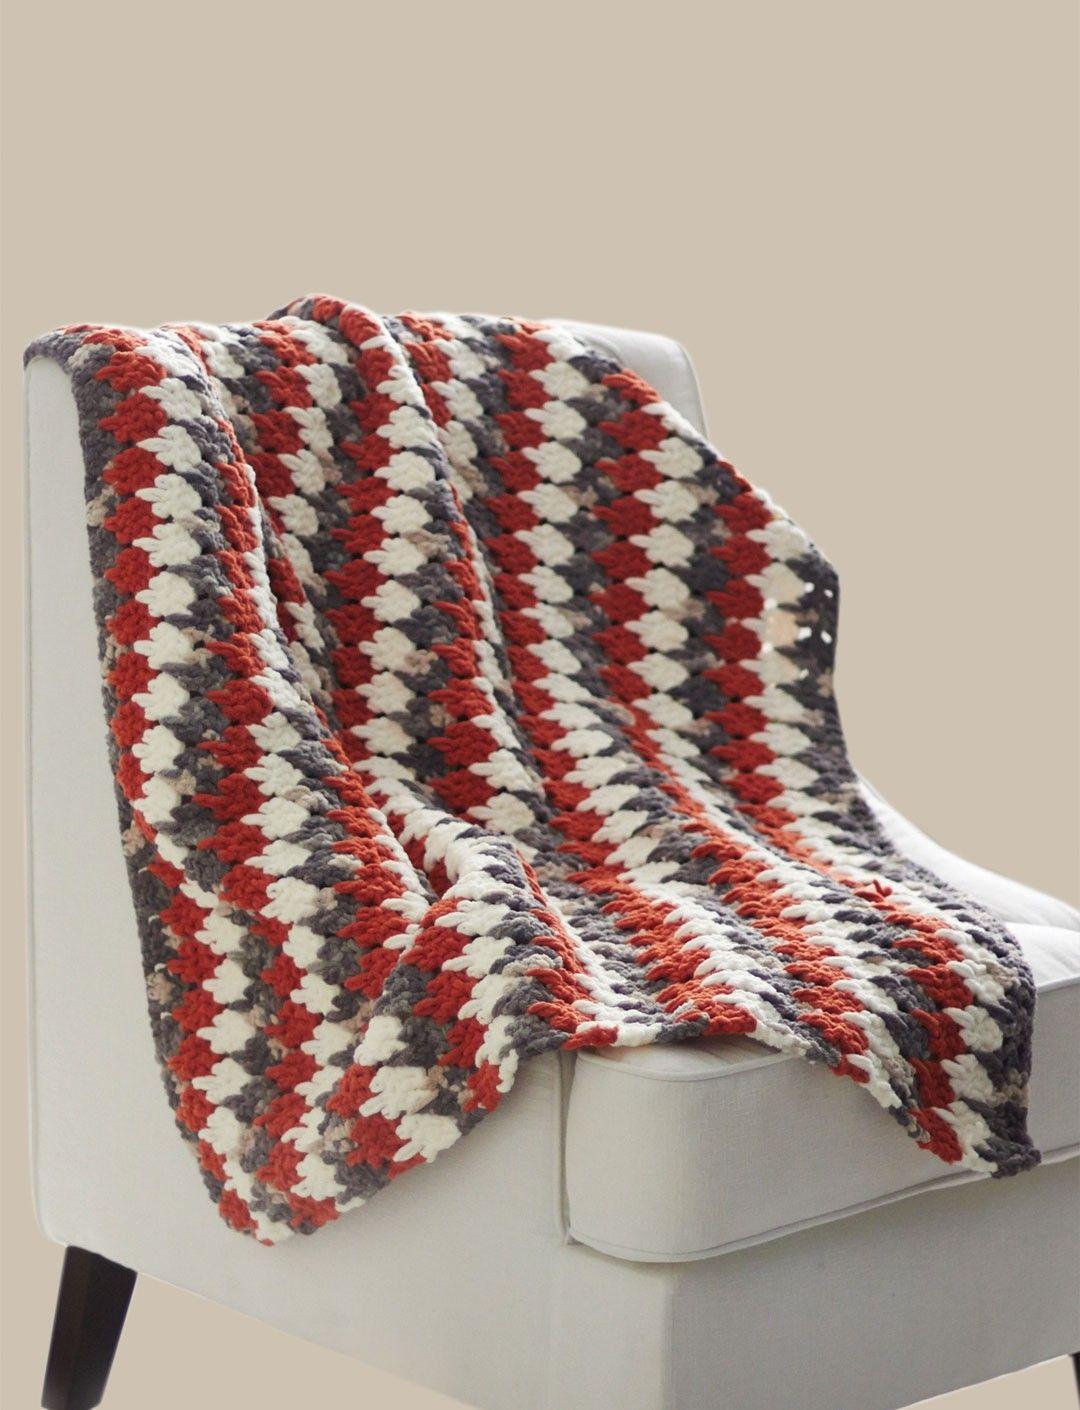 Yarnspirations.com+-+Bernat+Larksfoot+Blanket+-+Patterns++|+ ...